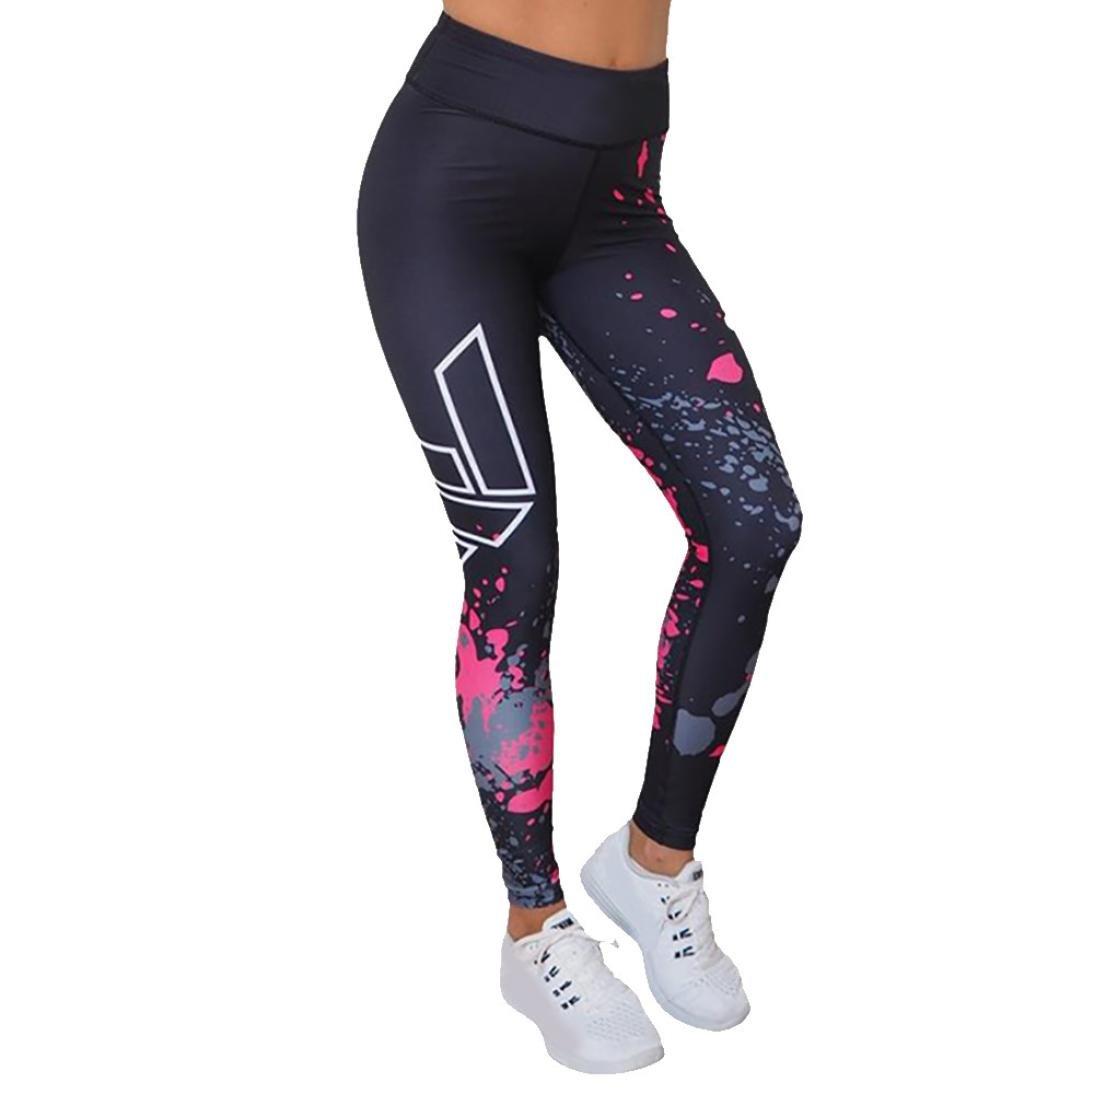 Goodtrade8 Women Juniors Yoga Pants Jogger Workout Leggings Control Sport Running Athletic Stretch Leggings High Waist Pants Fitness Trousers (M, Black)